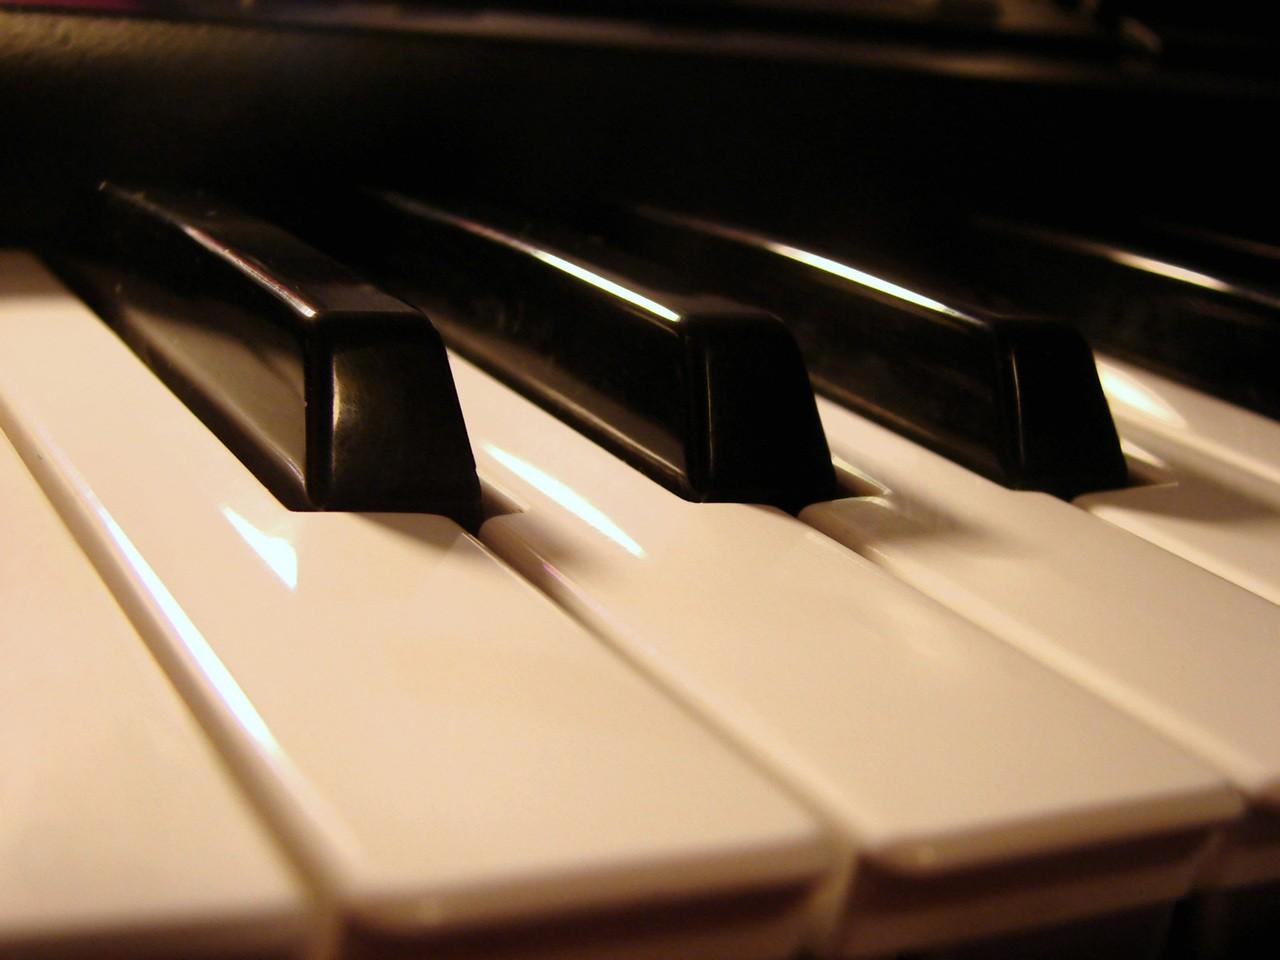 Droga do kariery muzyka